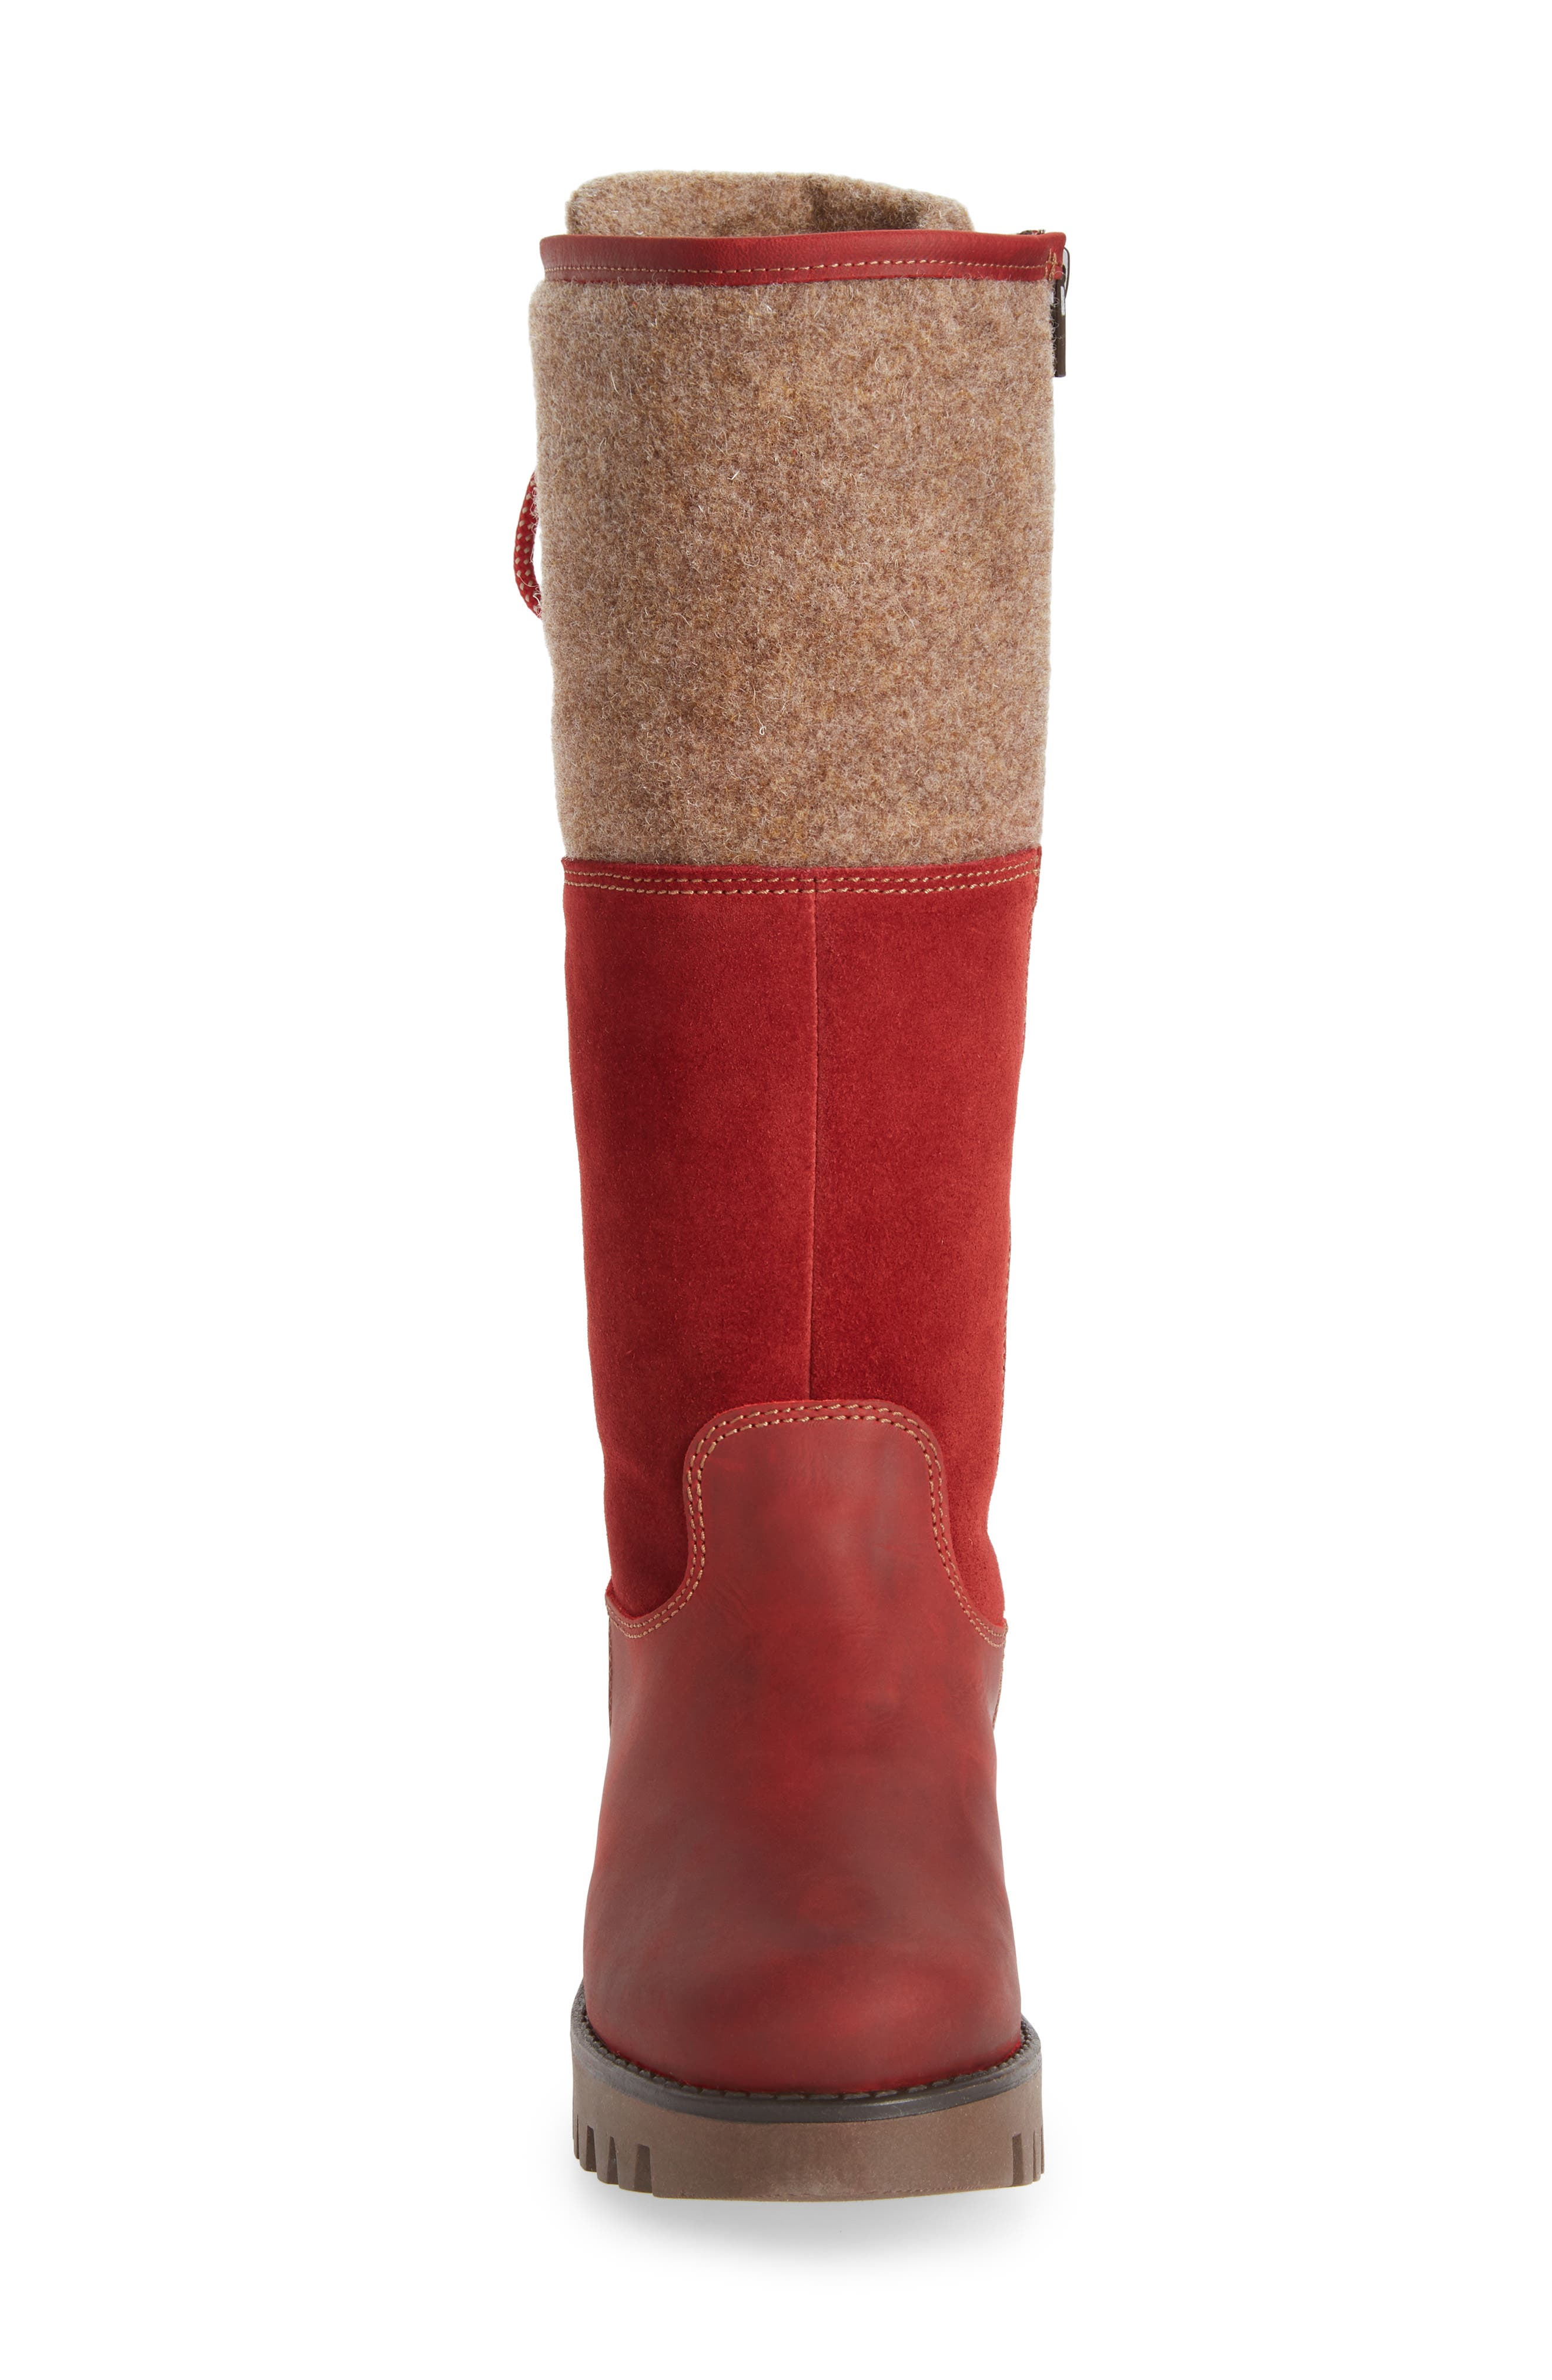 BOS. & CO., 'Ginger' Waterproof Mid Calf Platform Boot, Alternate thumbnail 4, color, RED/ SCARLET WOOL